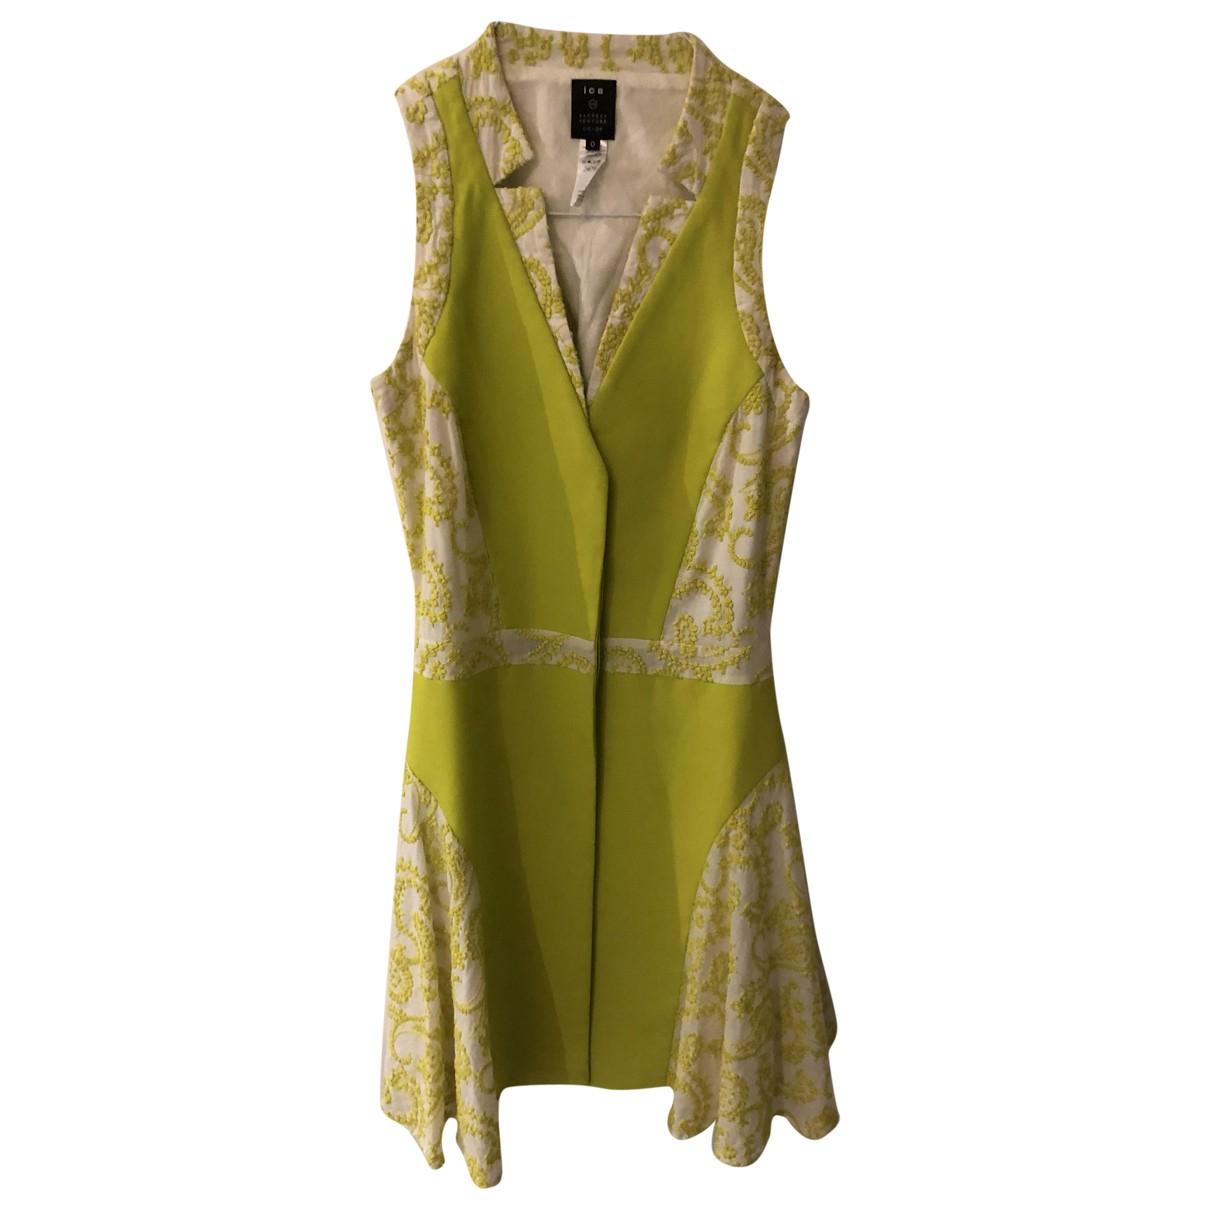 Icb - Robe   pour femme - multicolore